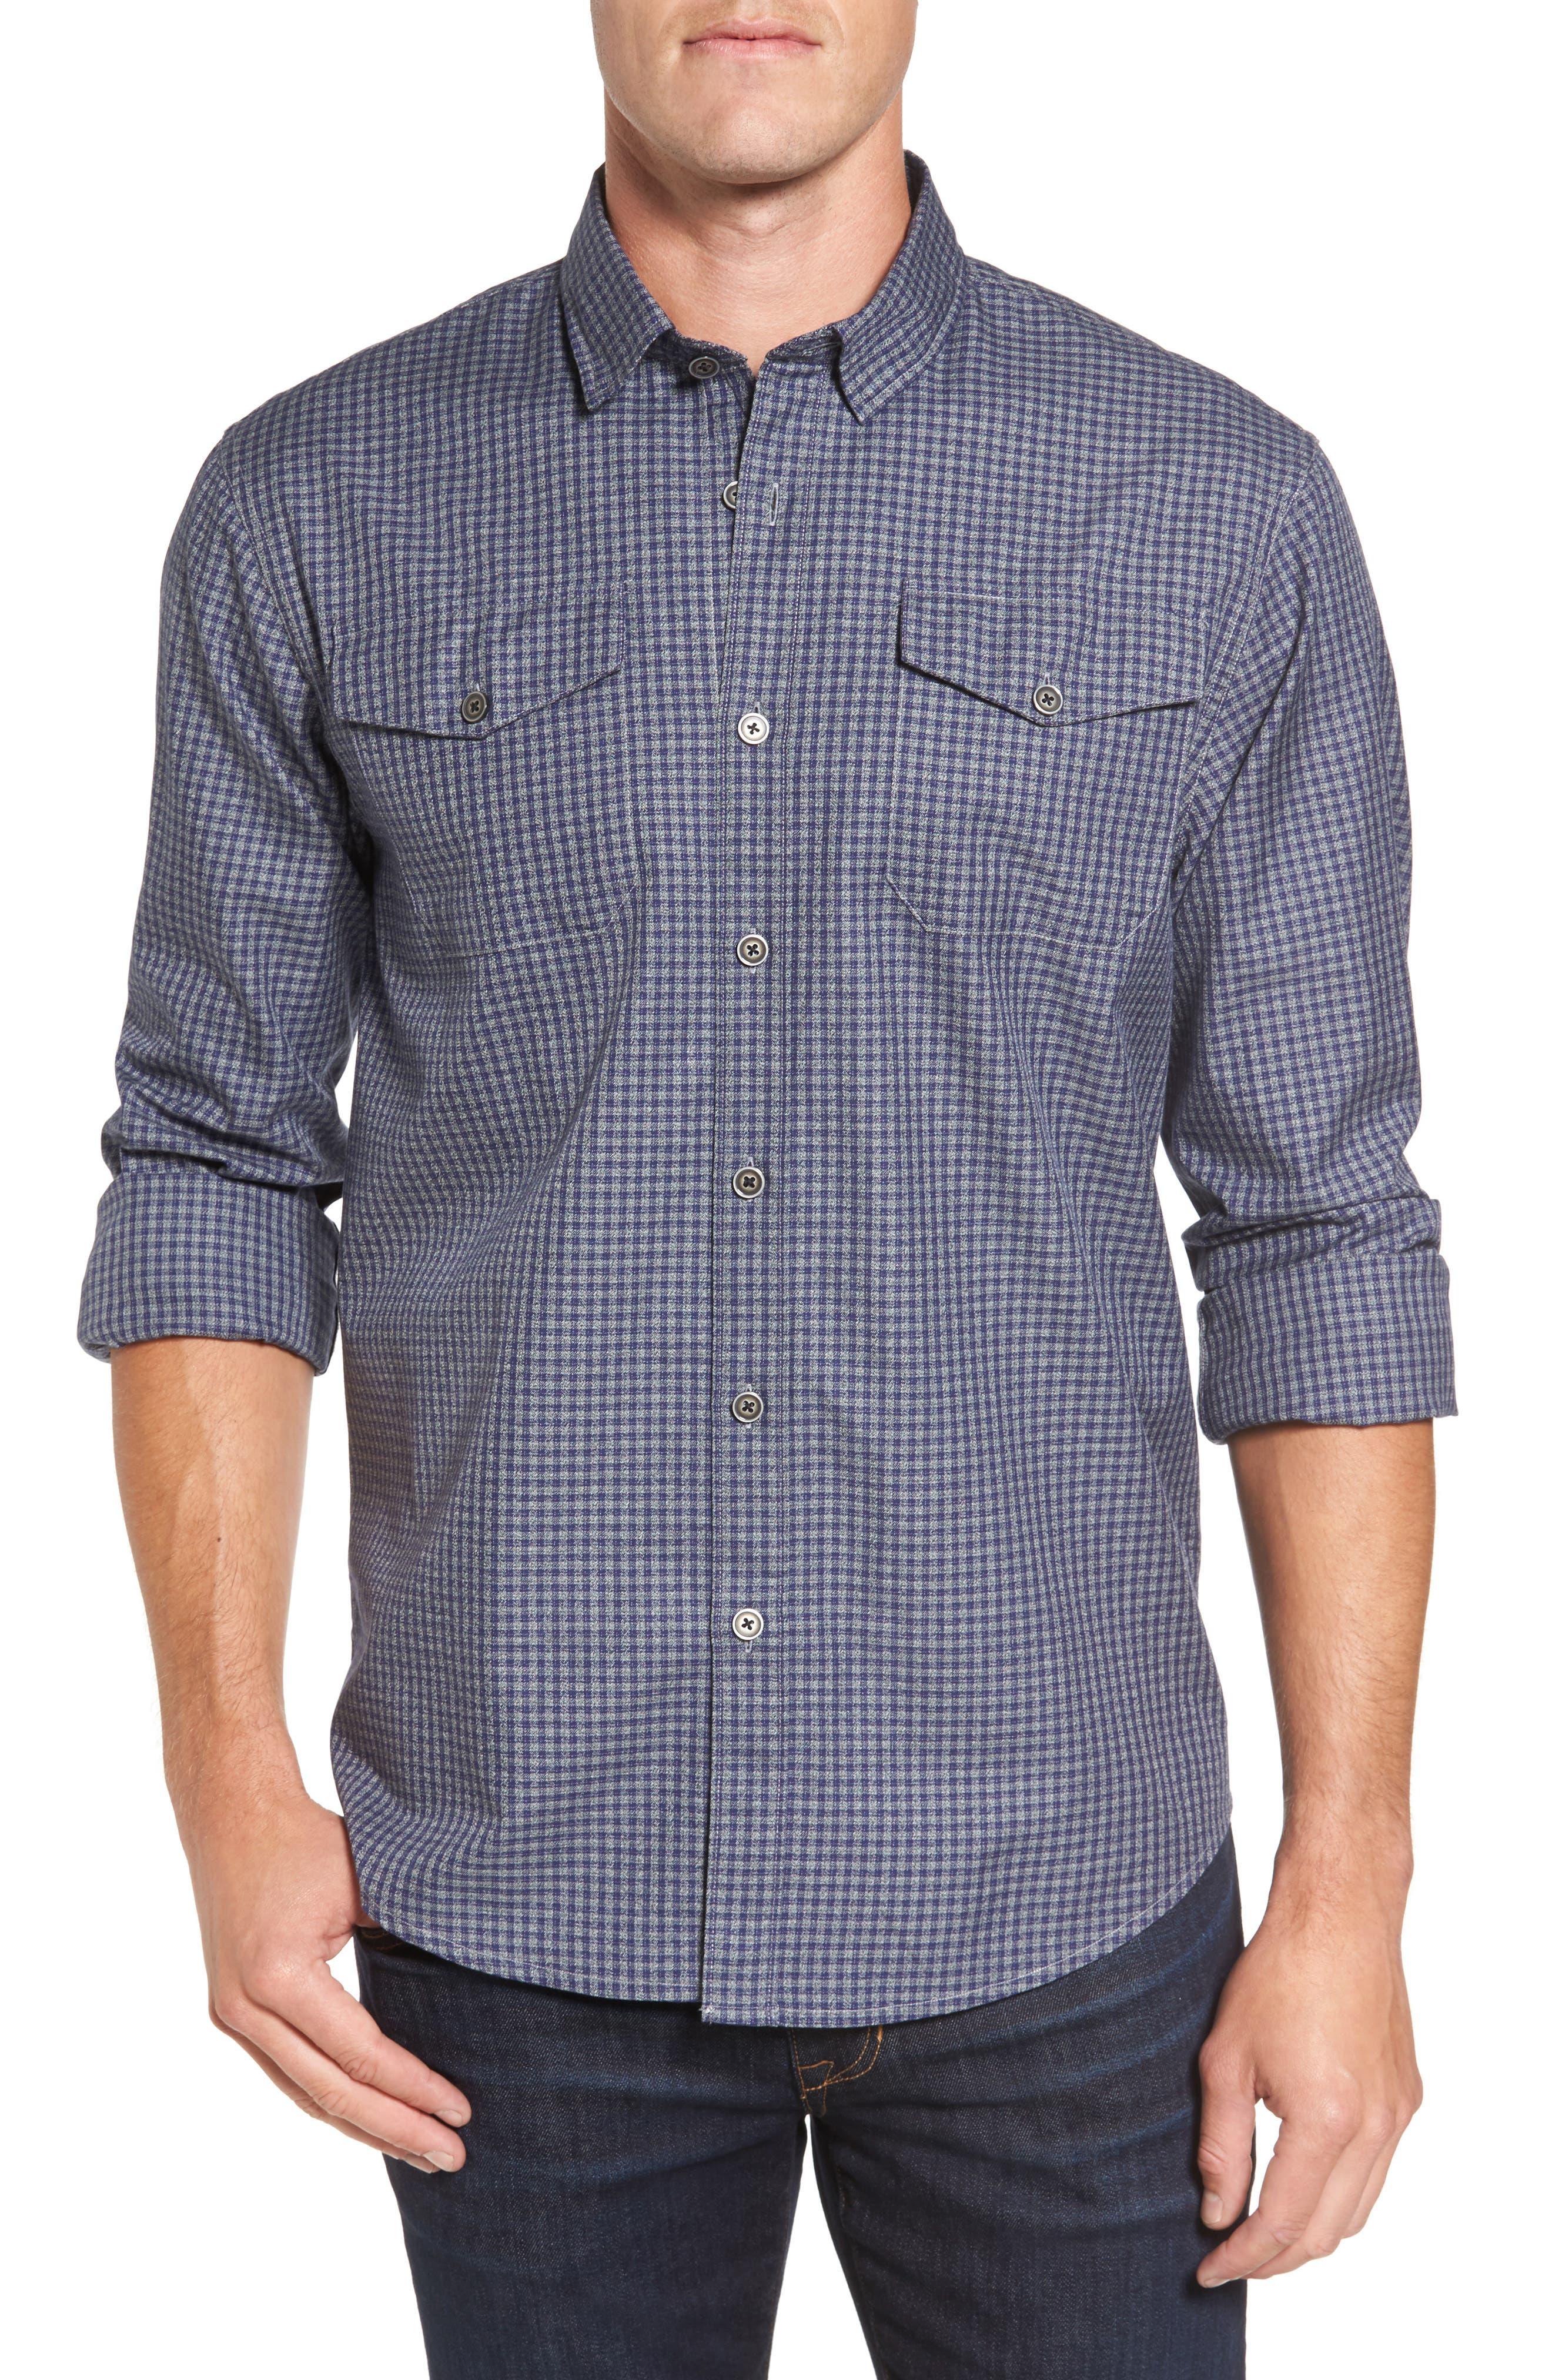 Main Street Check Flannel Shirt,                         Main,                         color, Denim